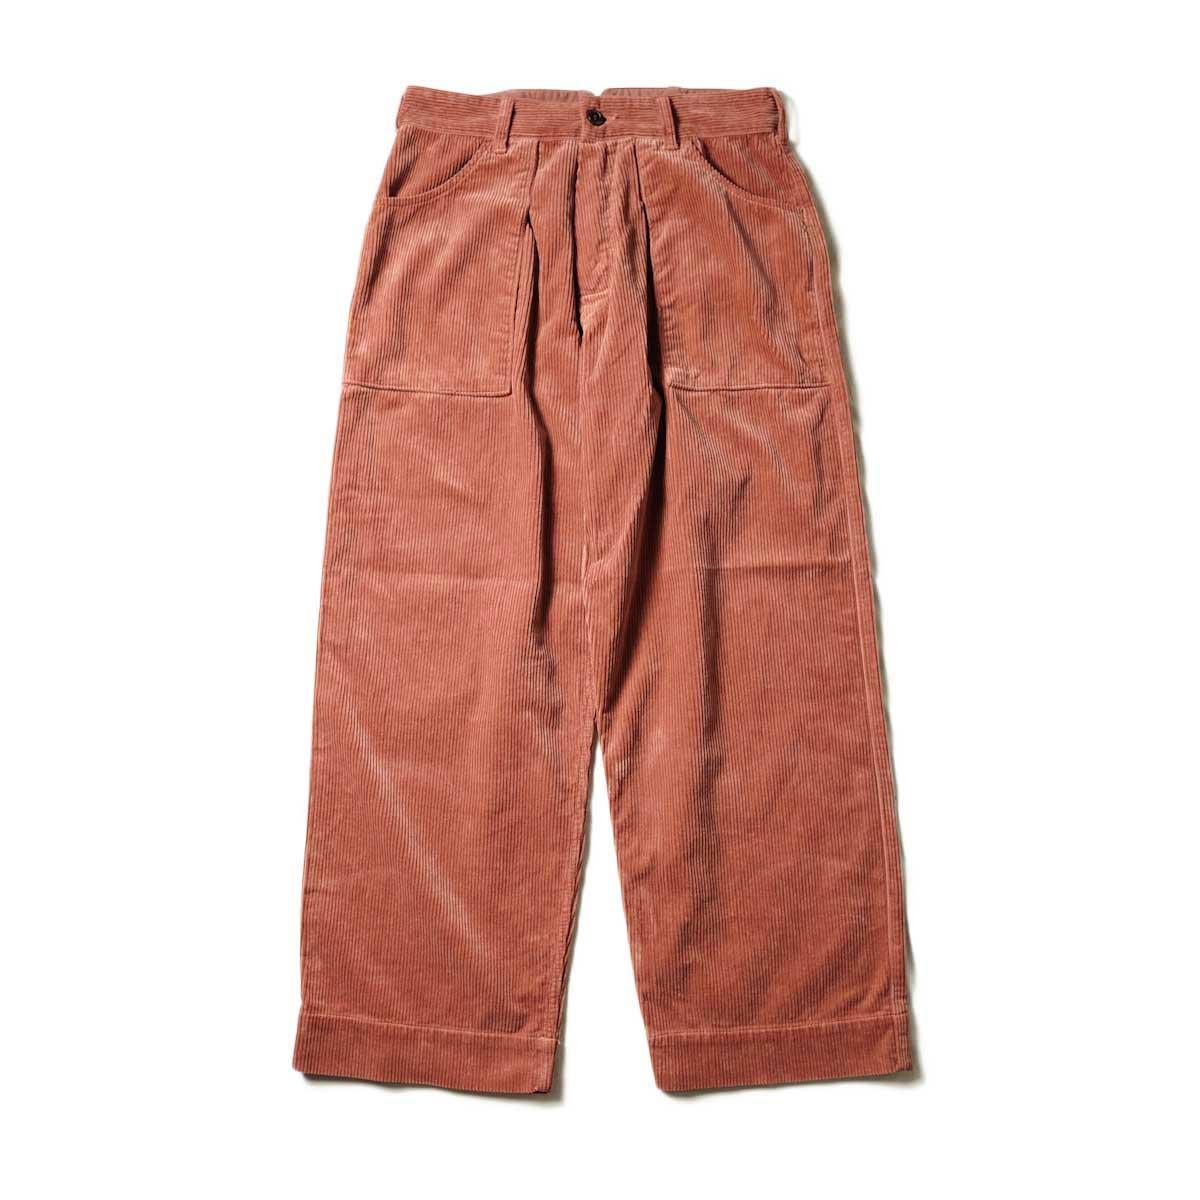 Willow Pants / P-001 - CORDUROY PANTS (Salmon Pink)